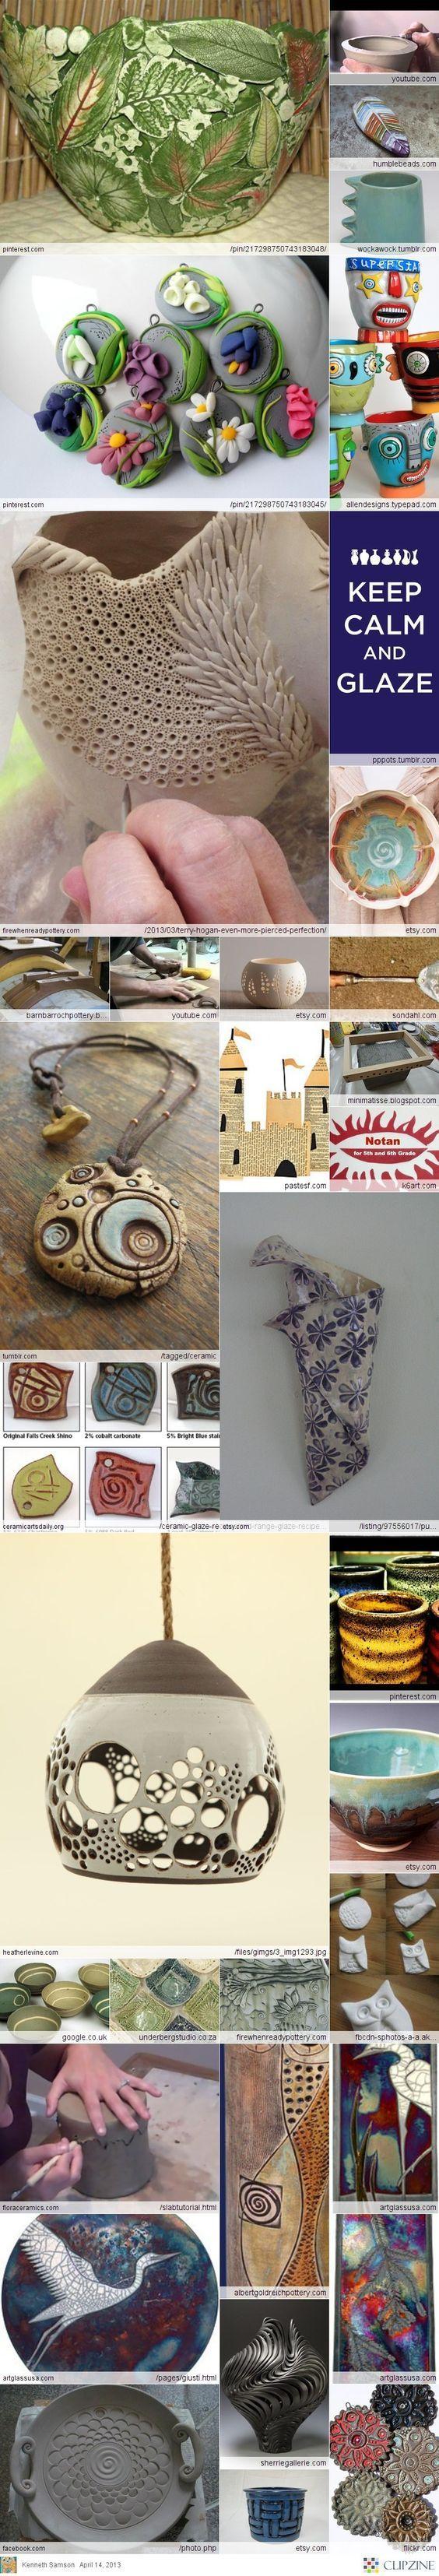 pottery ideas & inspiration